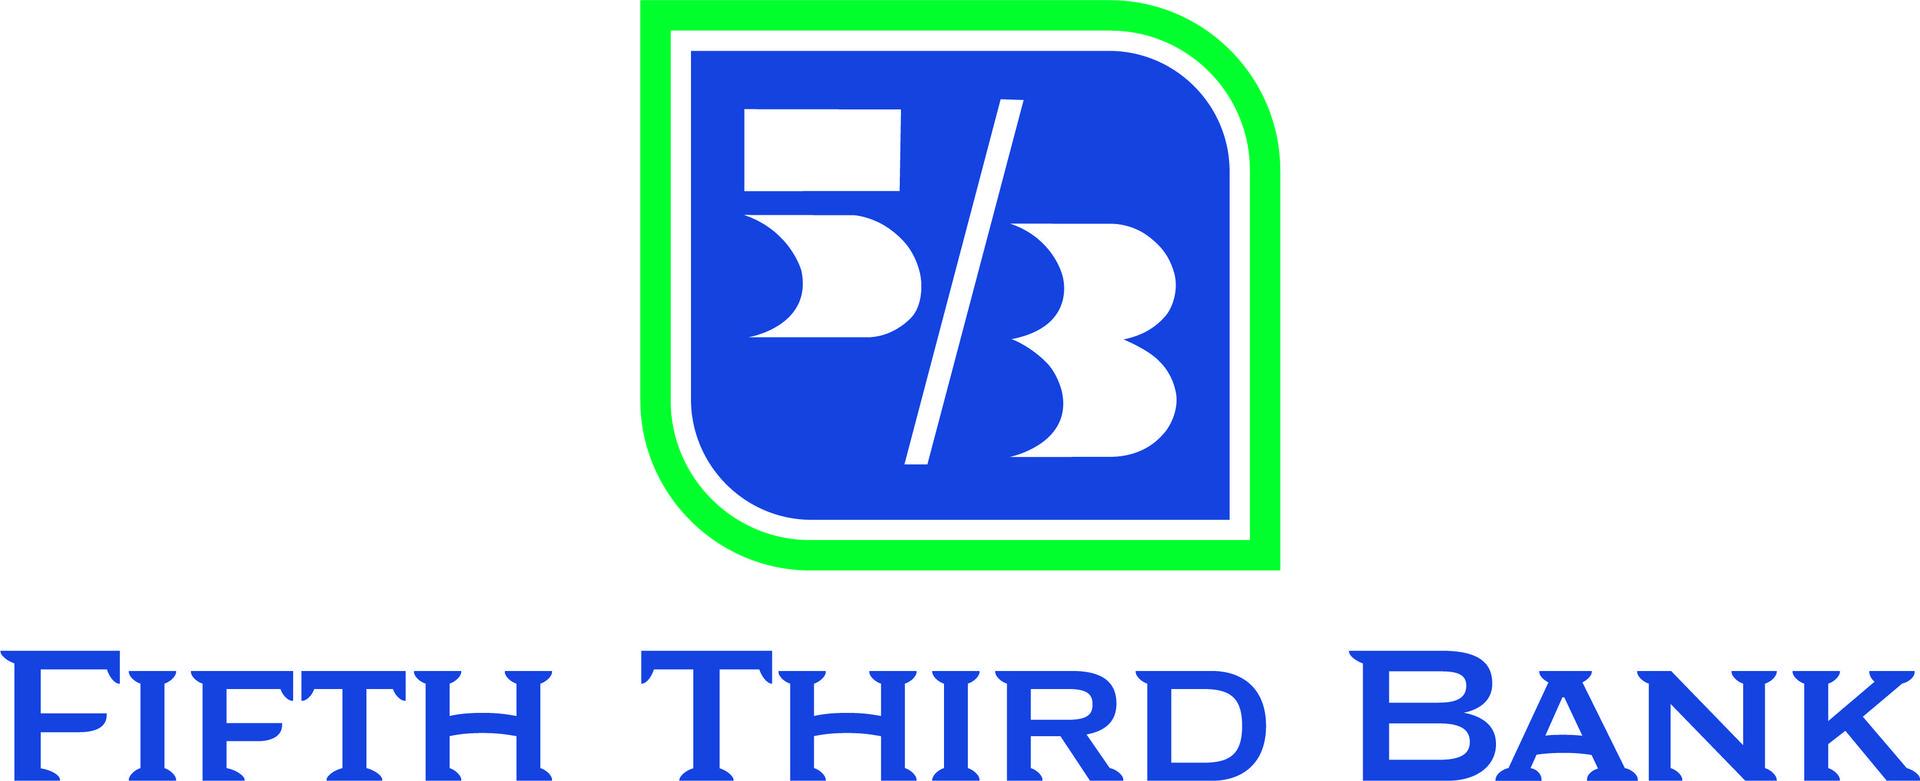 5/3 logo